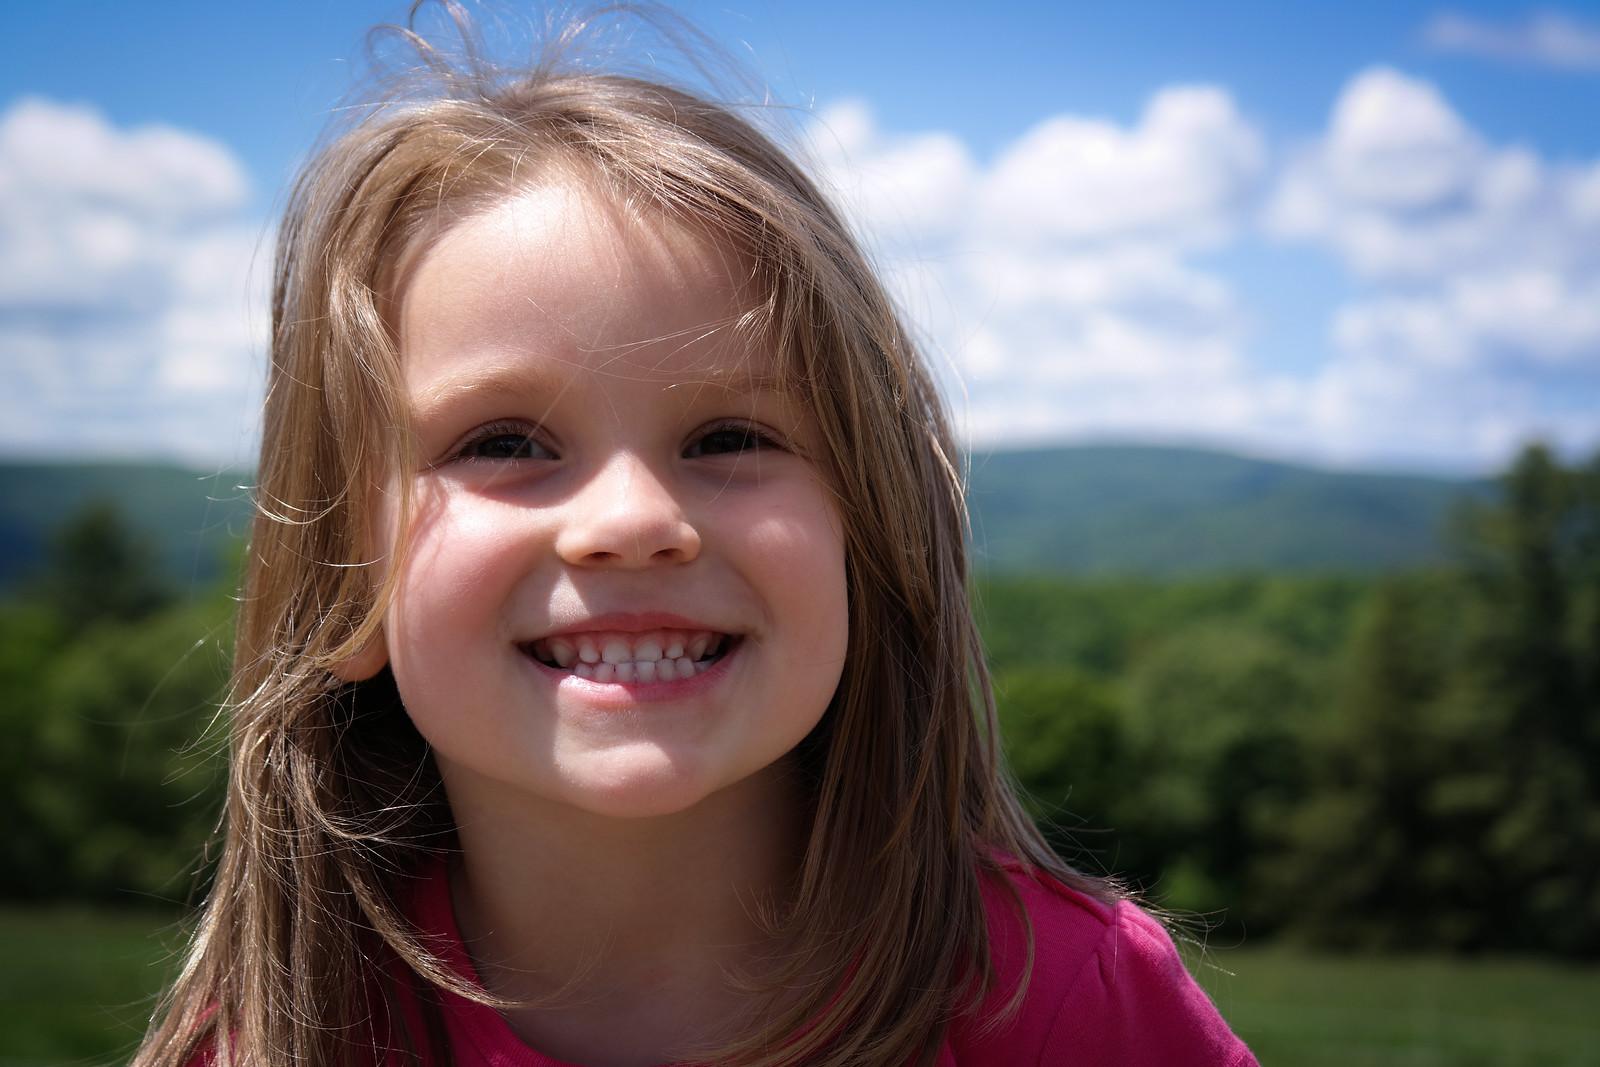 Smiling Bella